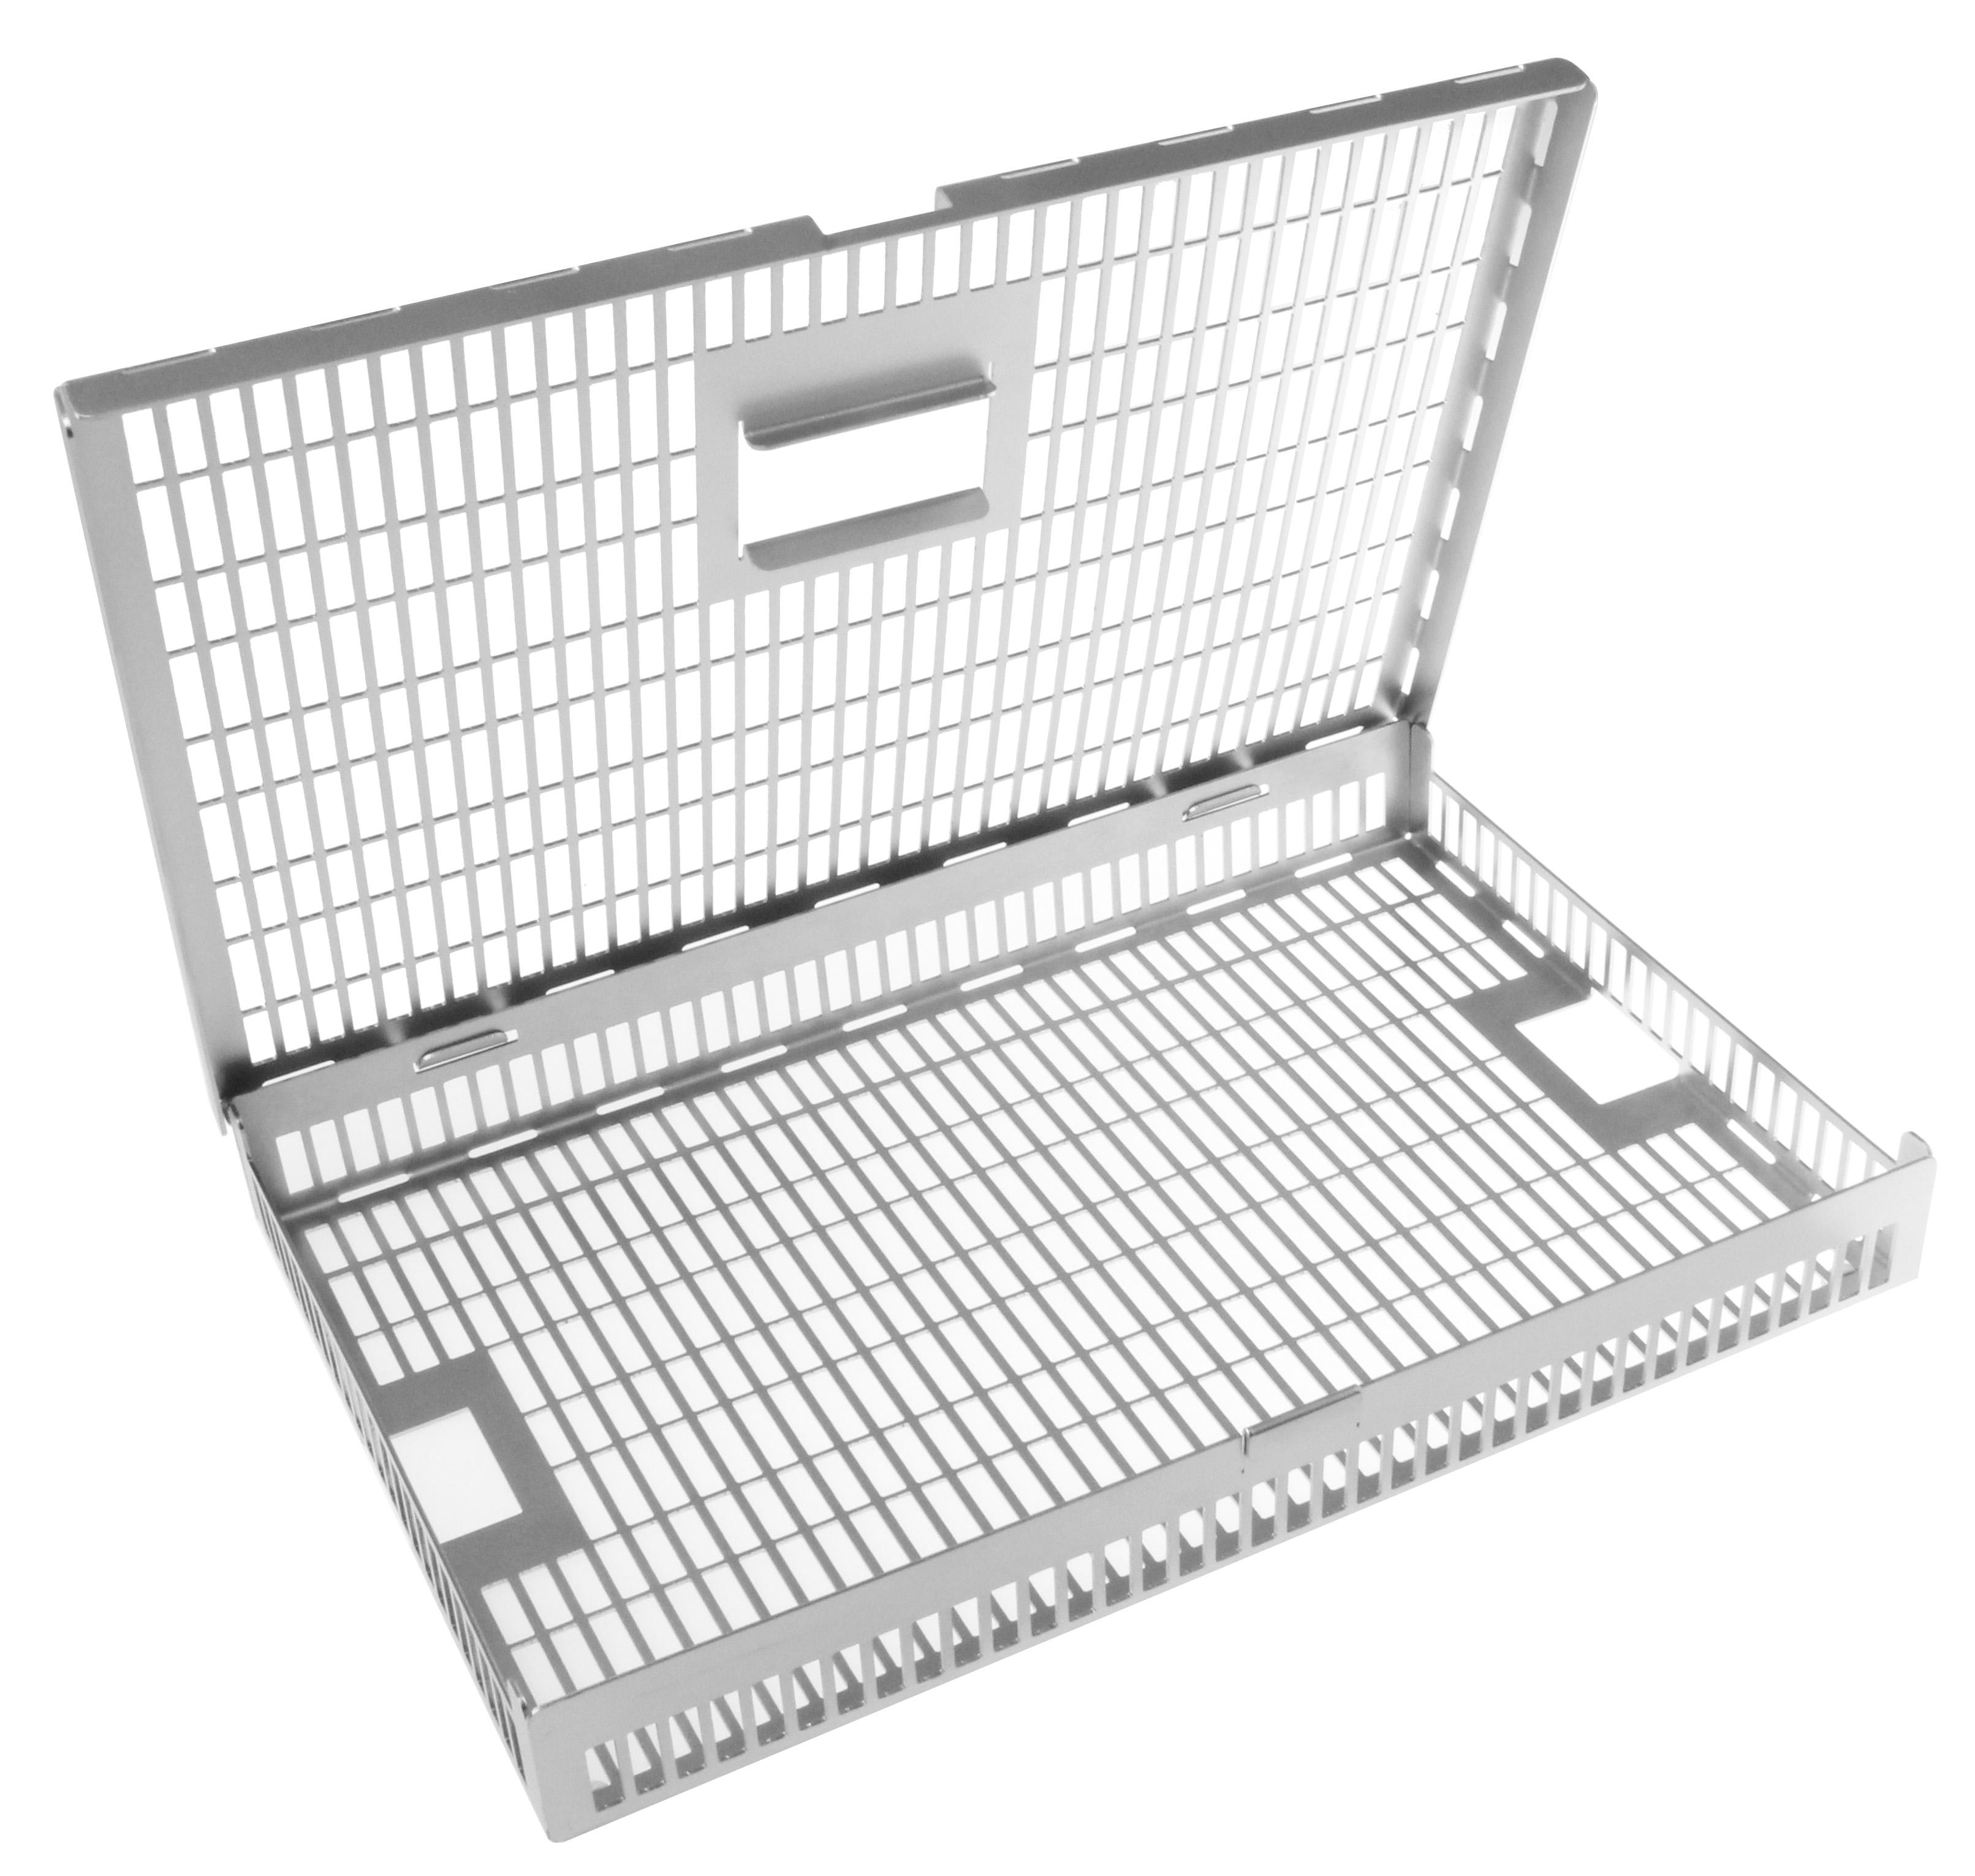 BASIC Wash Tray  (275x180x35mm)